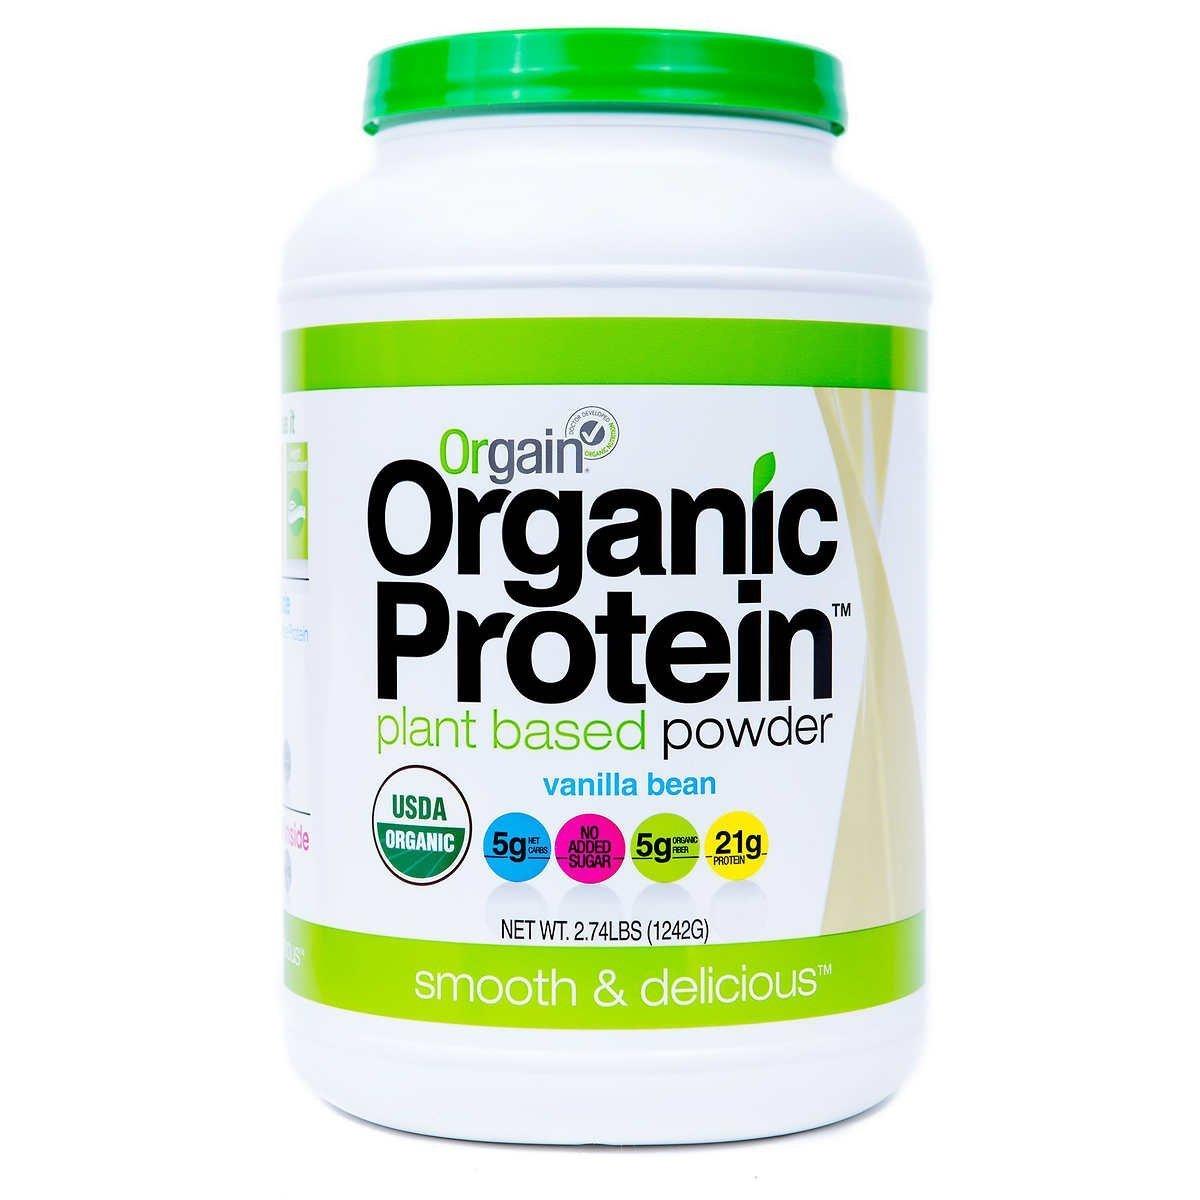 Orgain Organic Plant Based Protein Powder (Sweet Vanilla Bean, 2.74lb Tub)